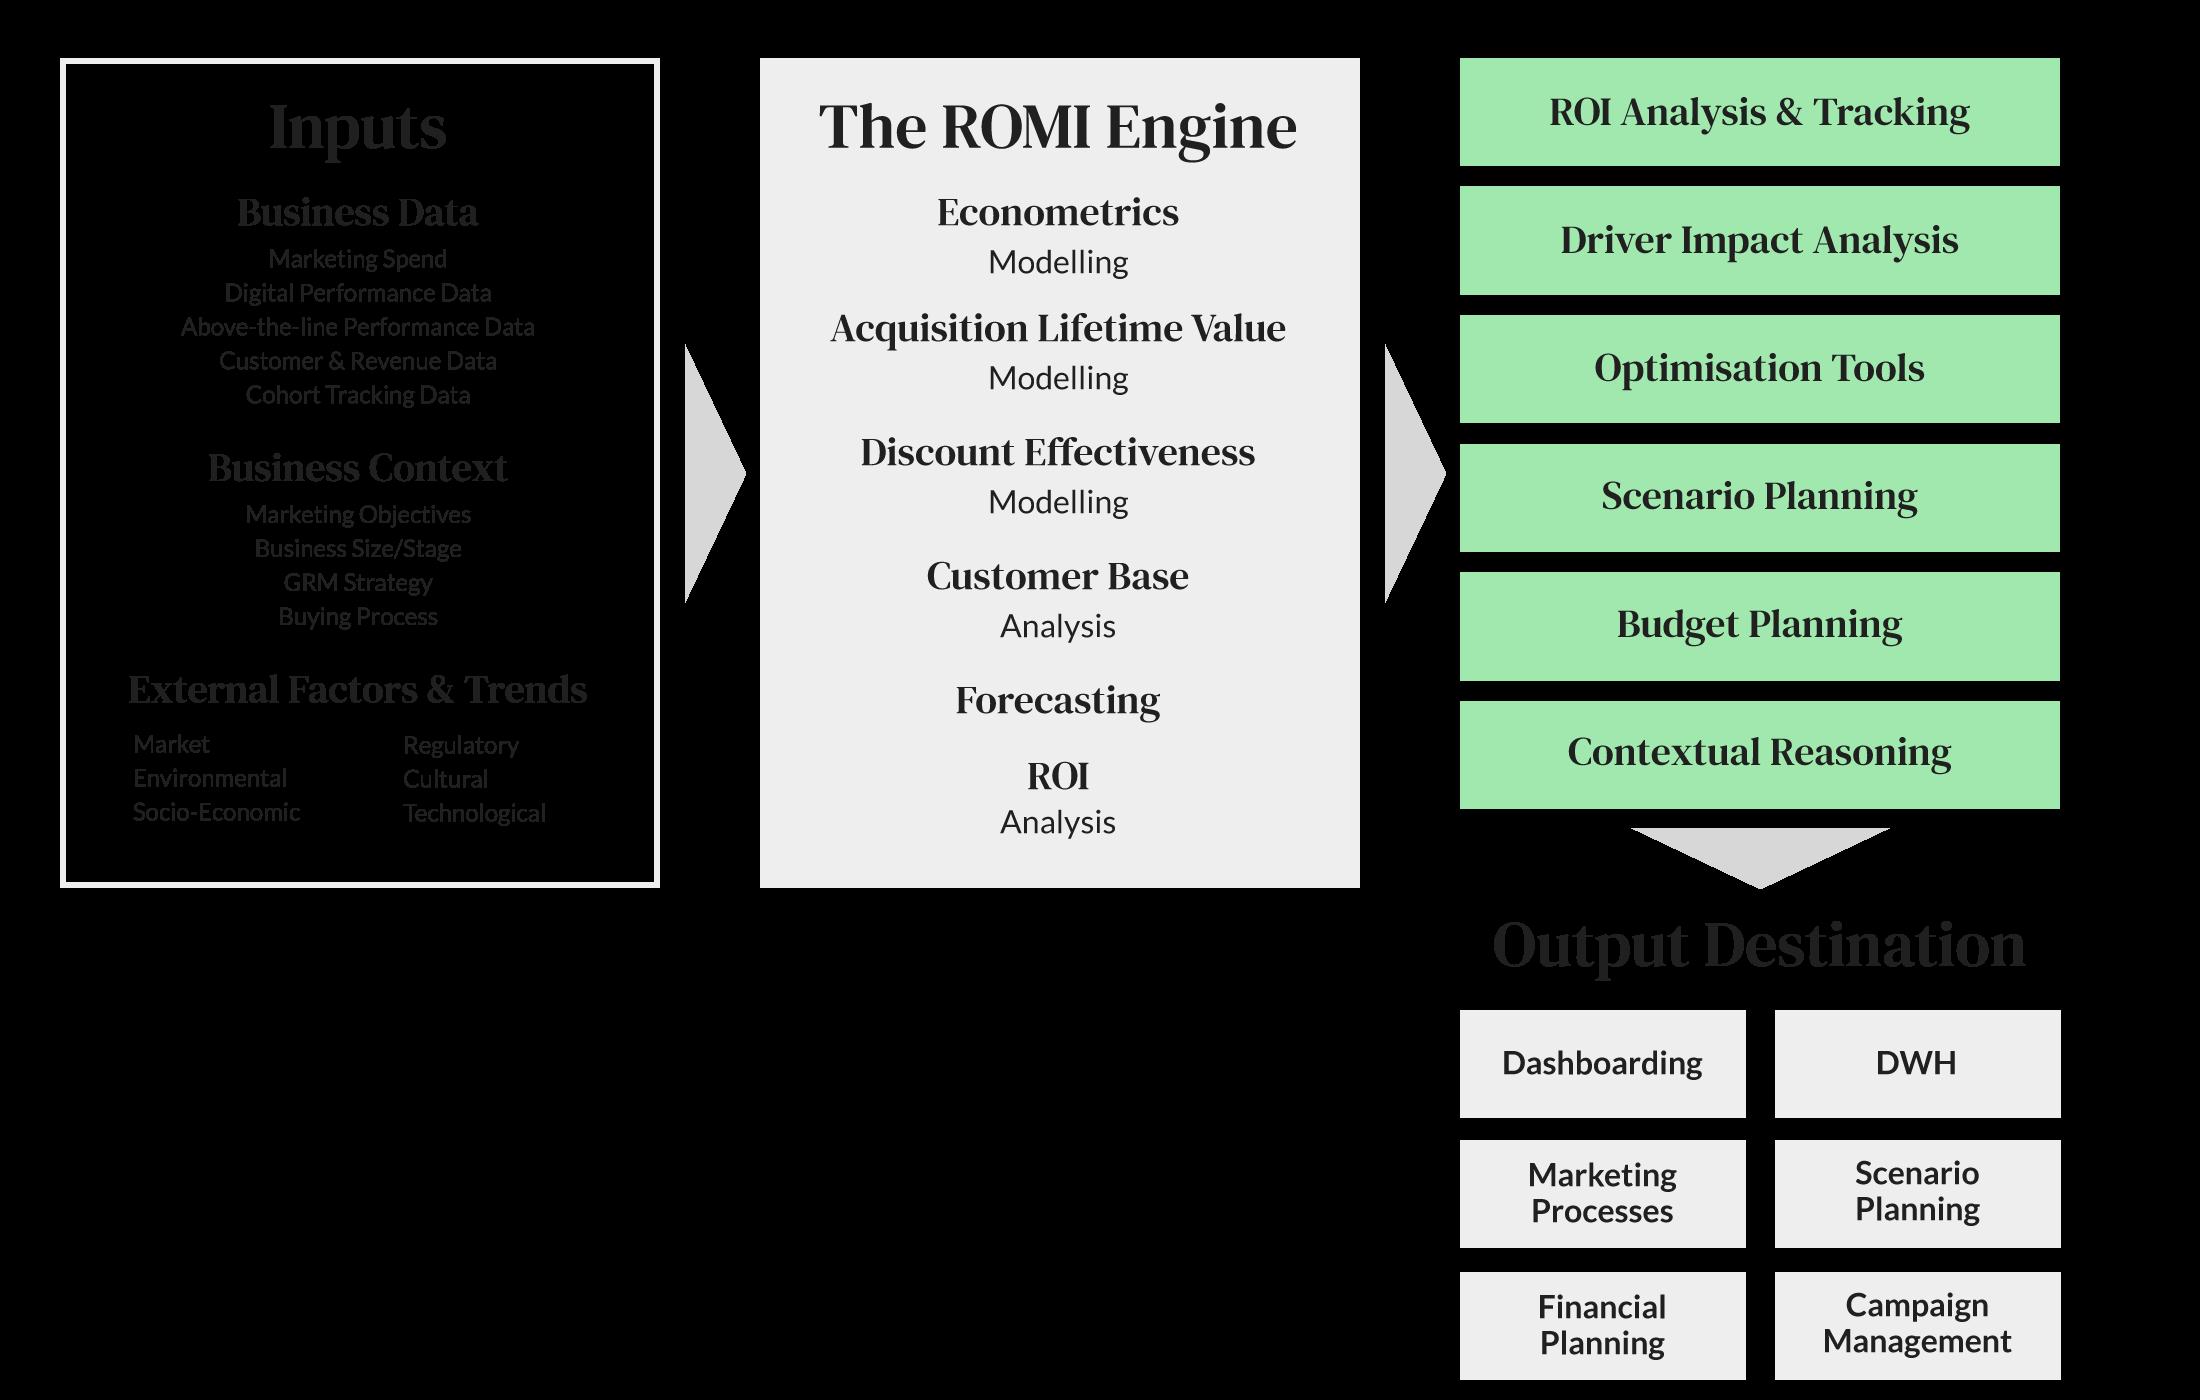 ROMI Engine